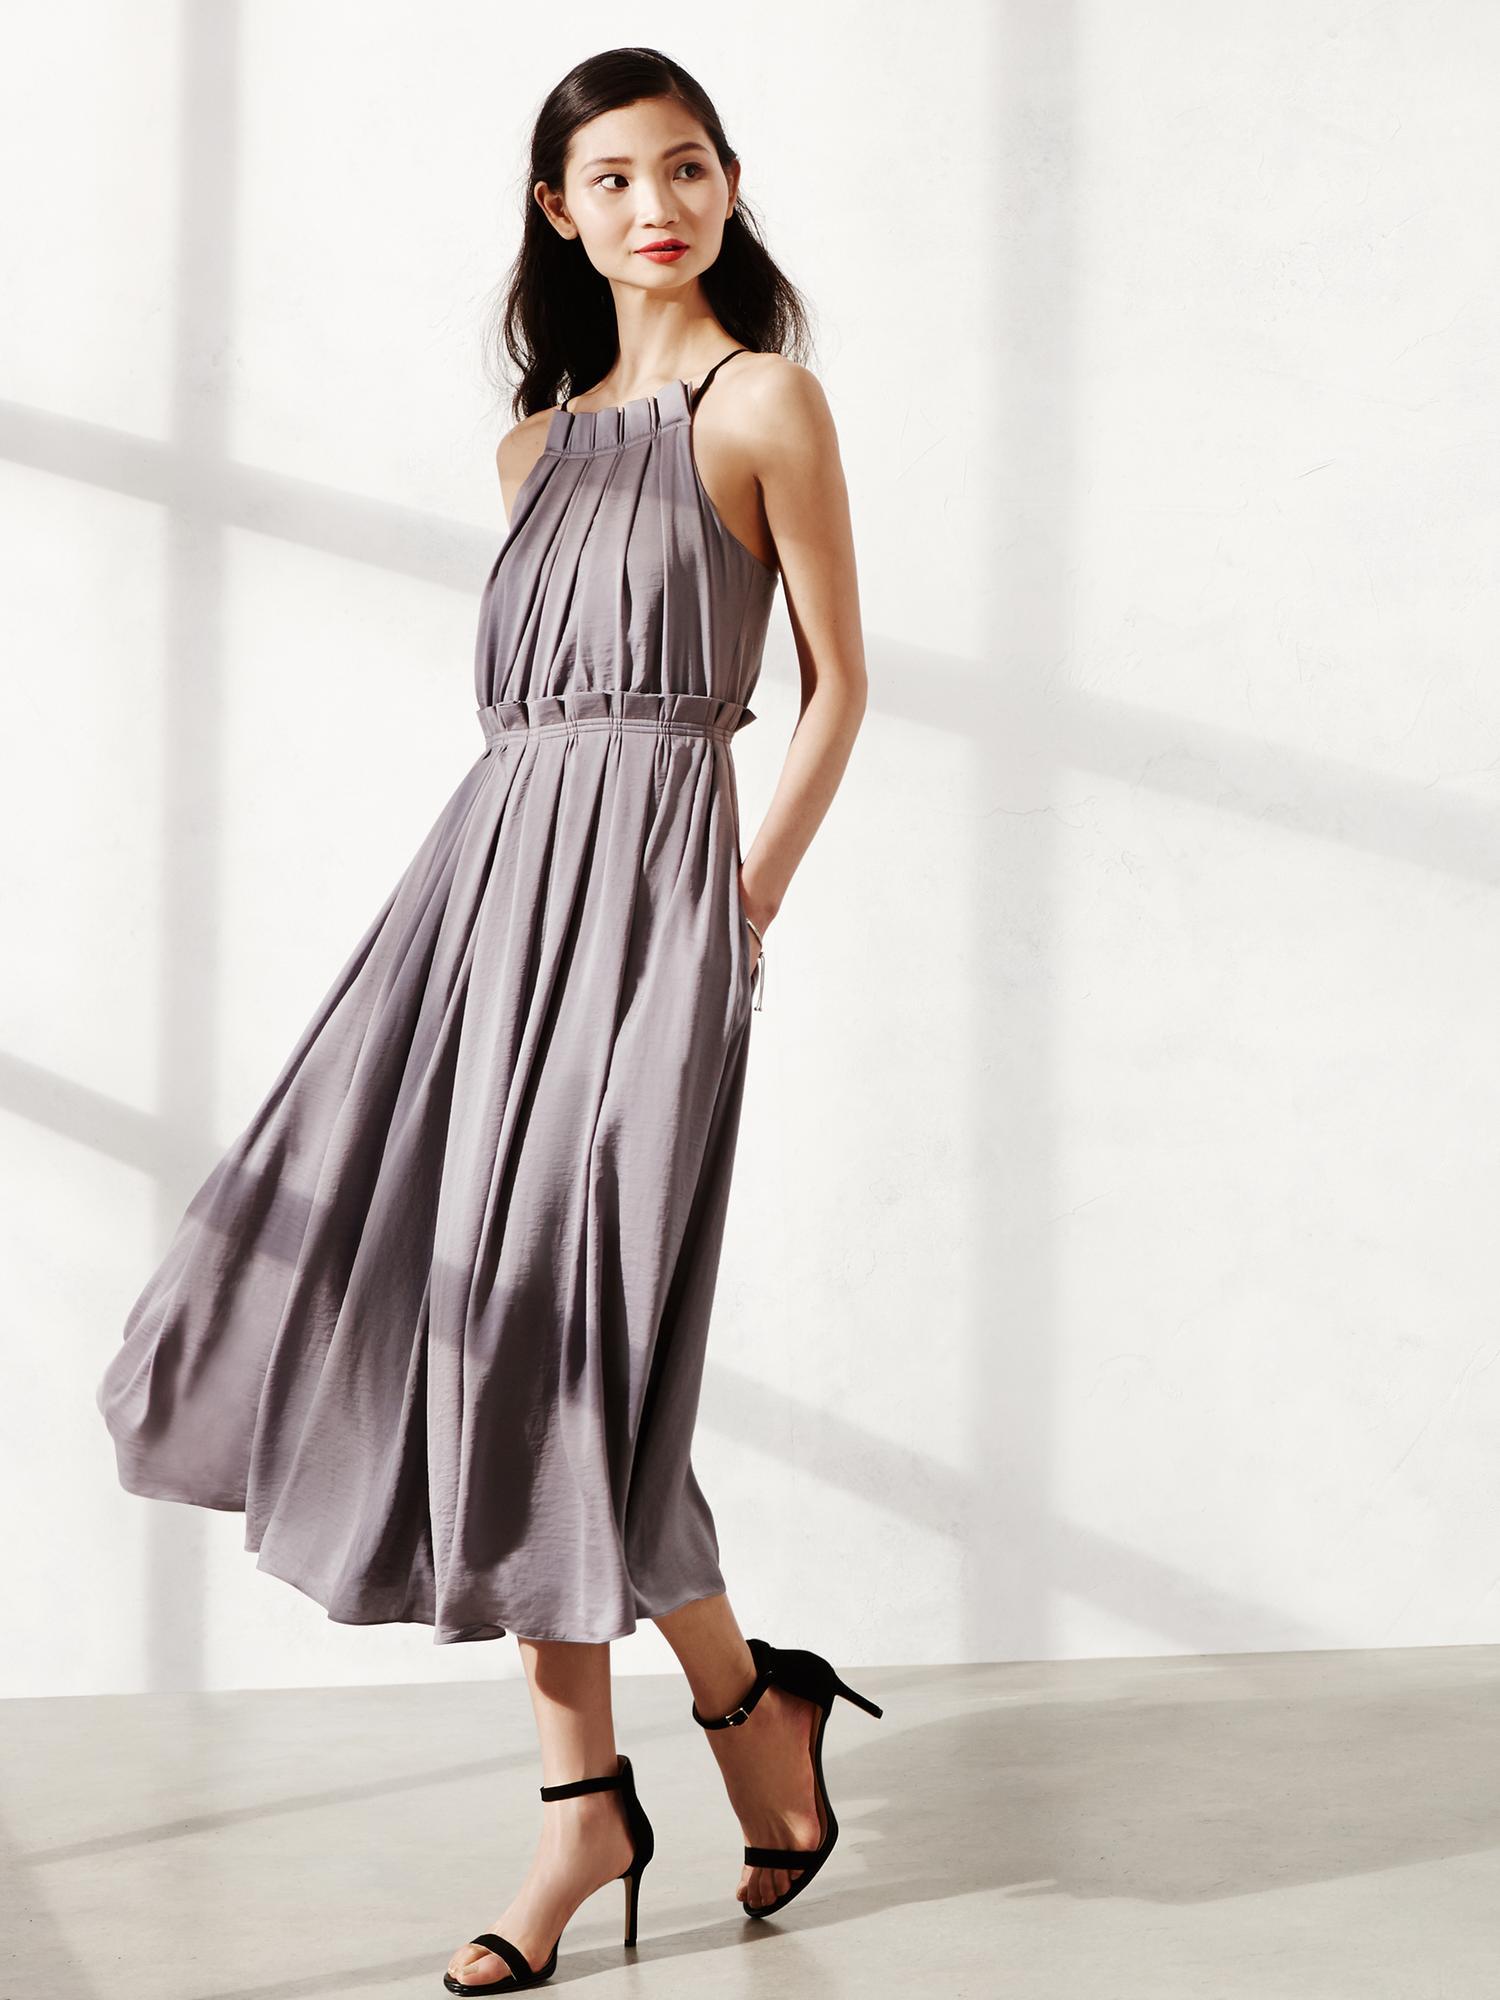 8060b8a4ffa Lyst - Banana Republic Br Monogram Pleated Gray Halter Dress in Gray